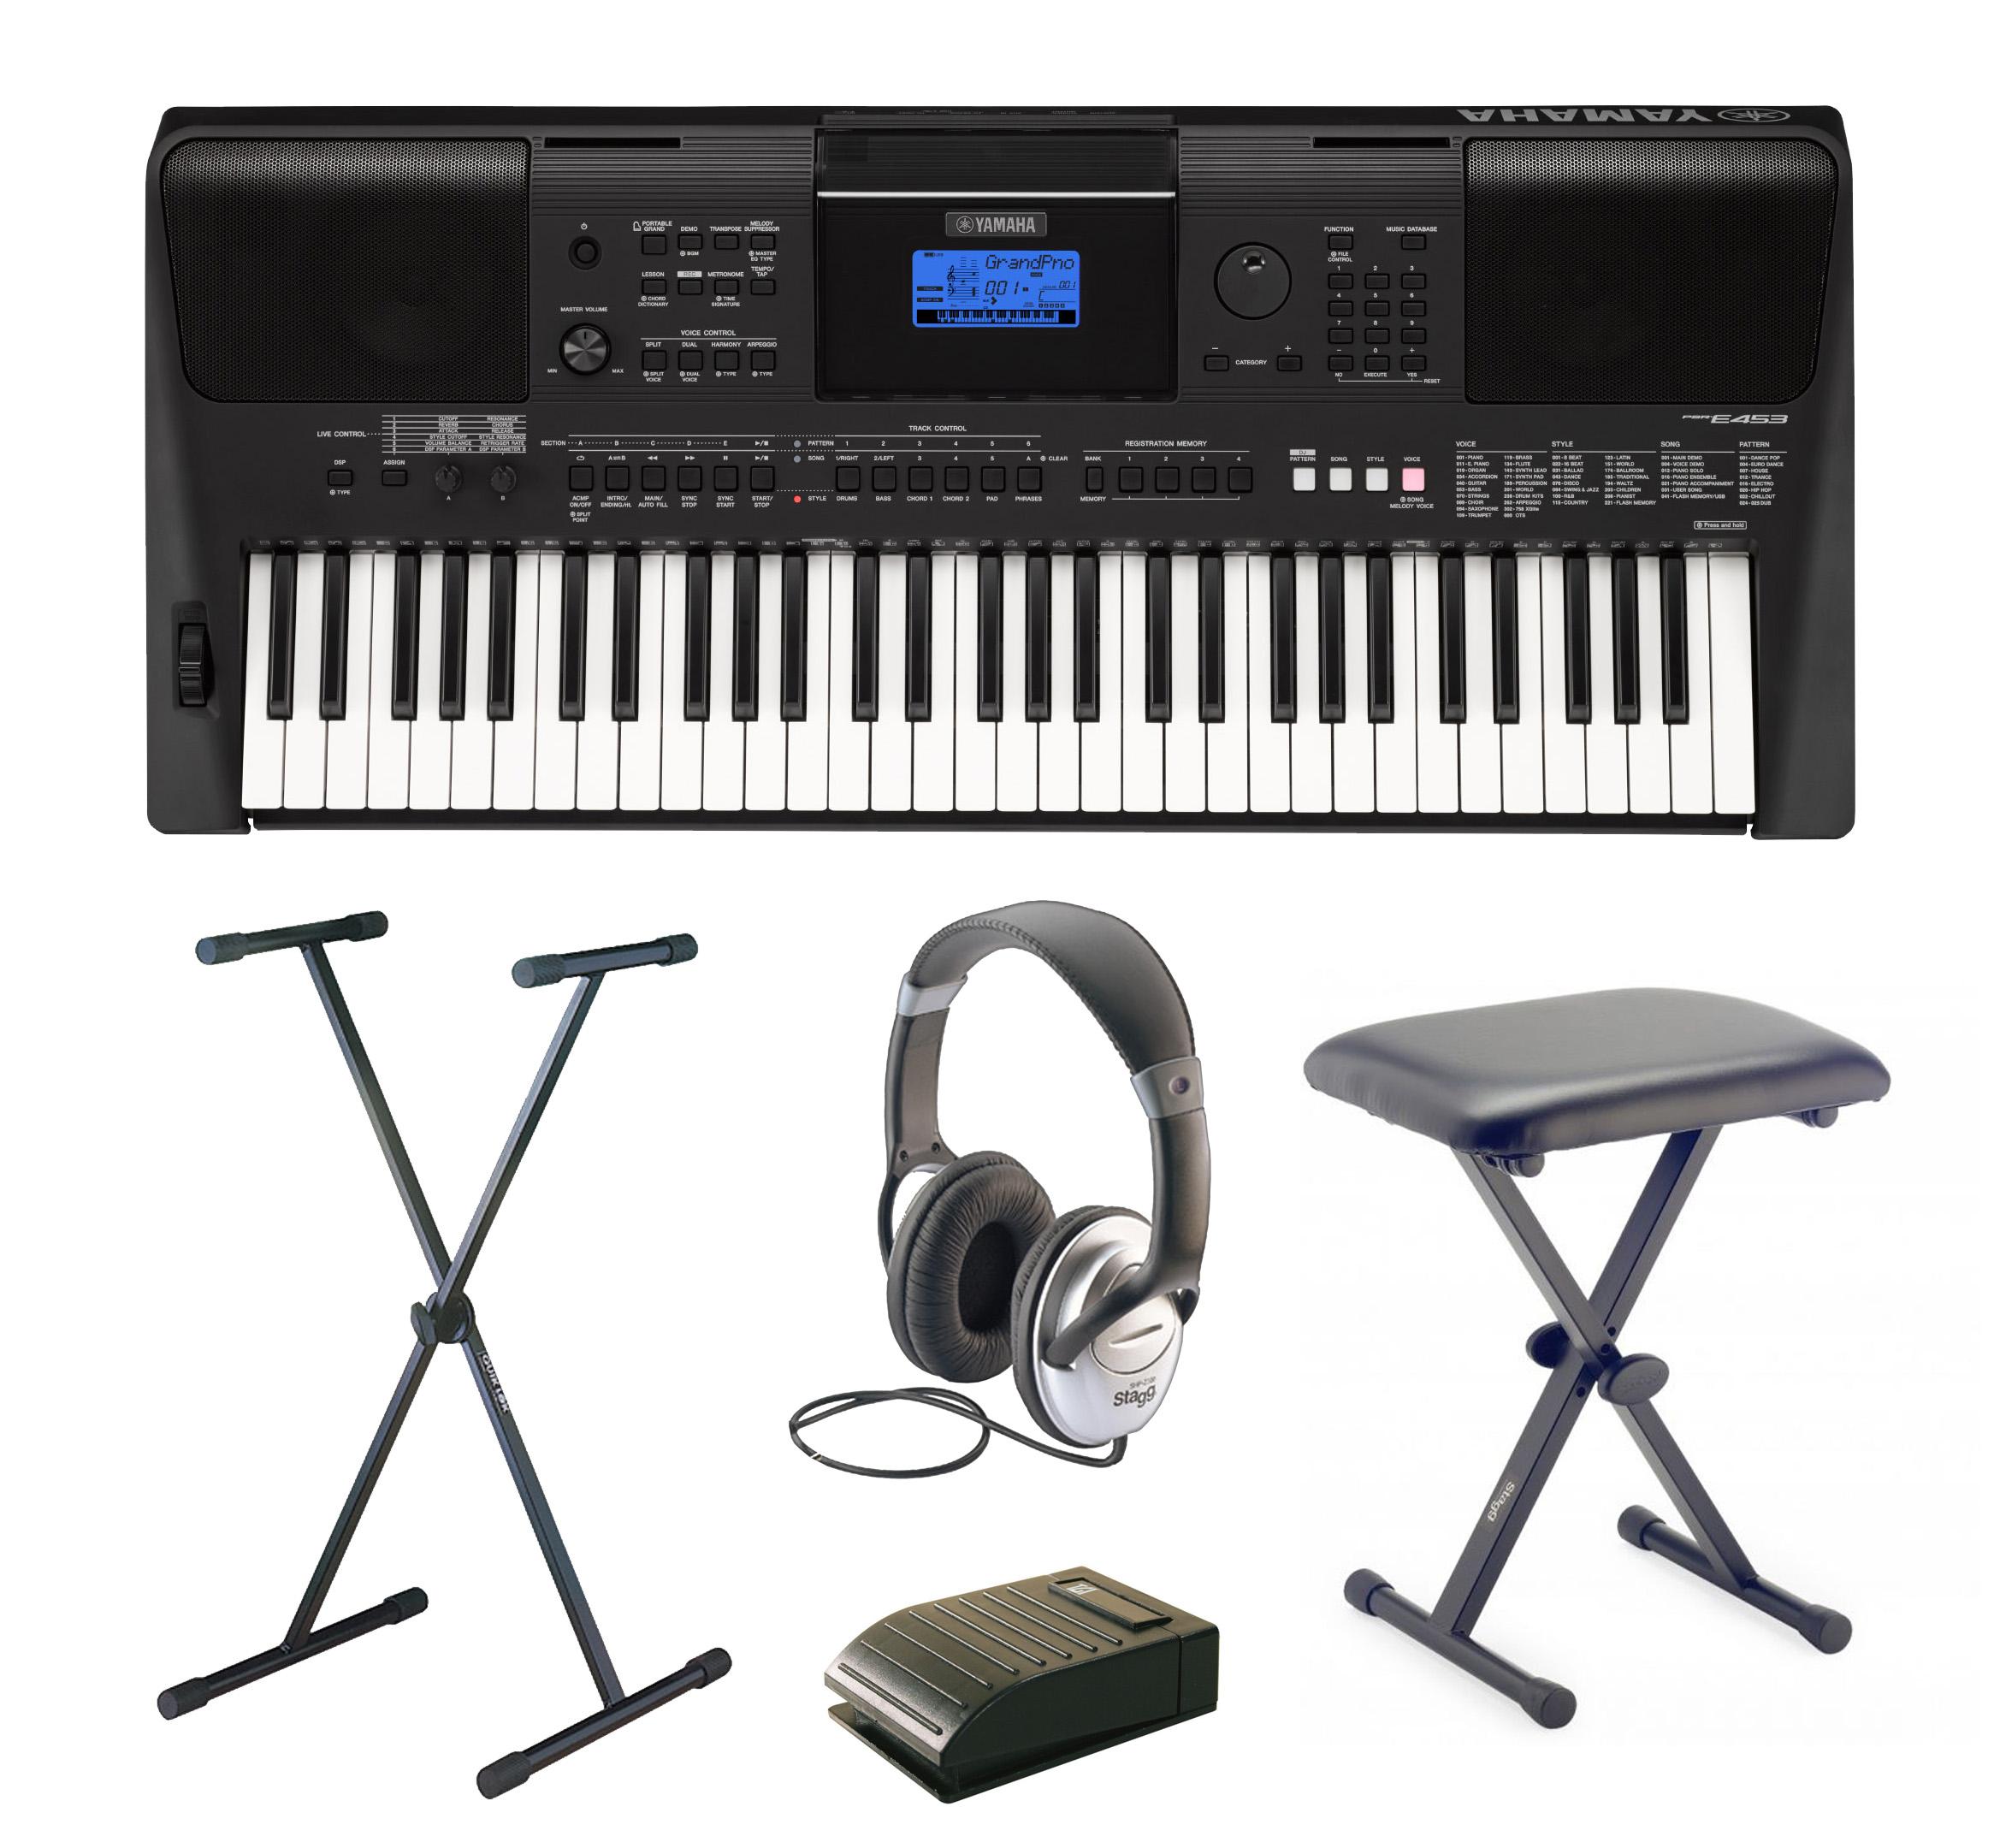 yamaha psr e453 complete home keyboard package includes. Black Bedroom Furniture Sets. Home Design Ideas